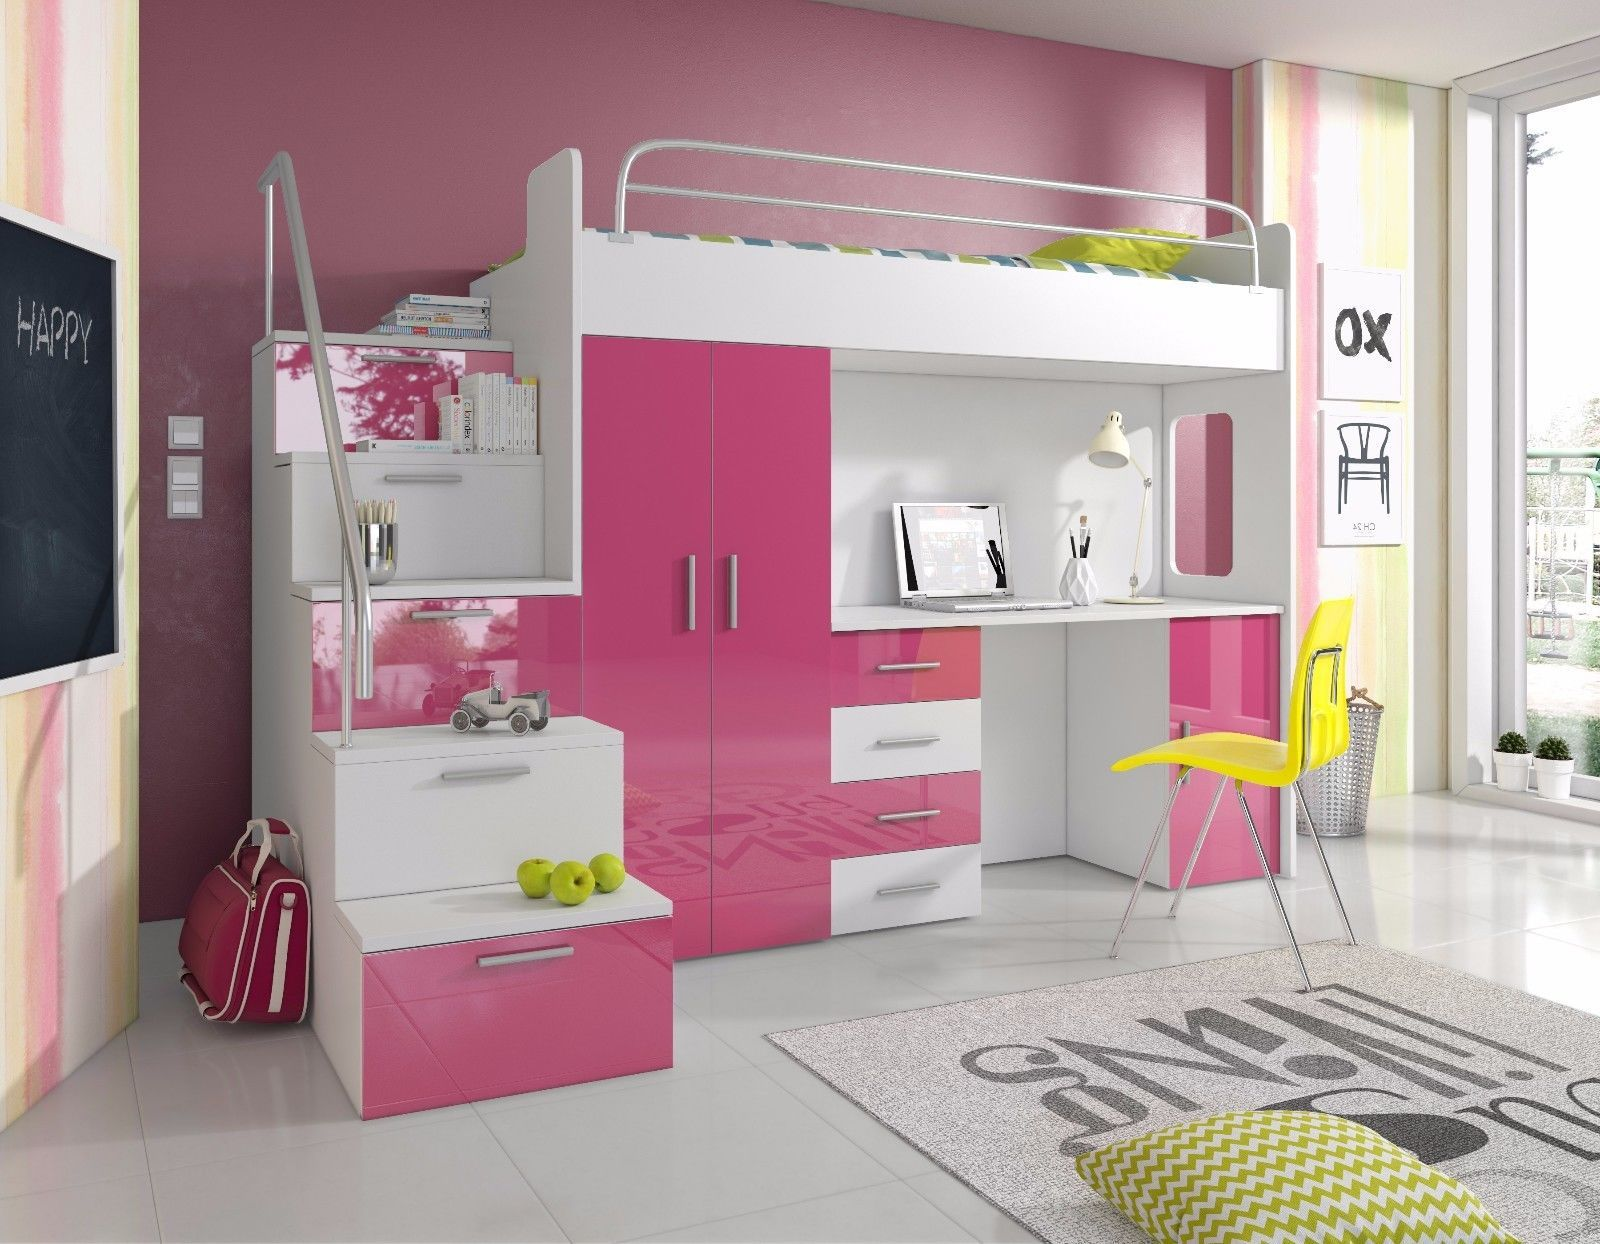 Bedroom Furniture 66742 New Kids Furniture Pink Vanity Table With